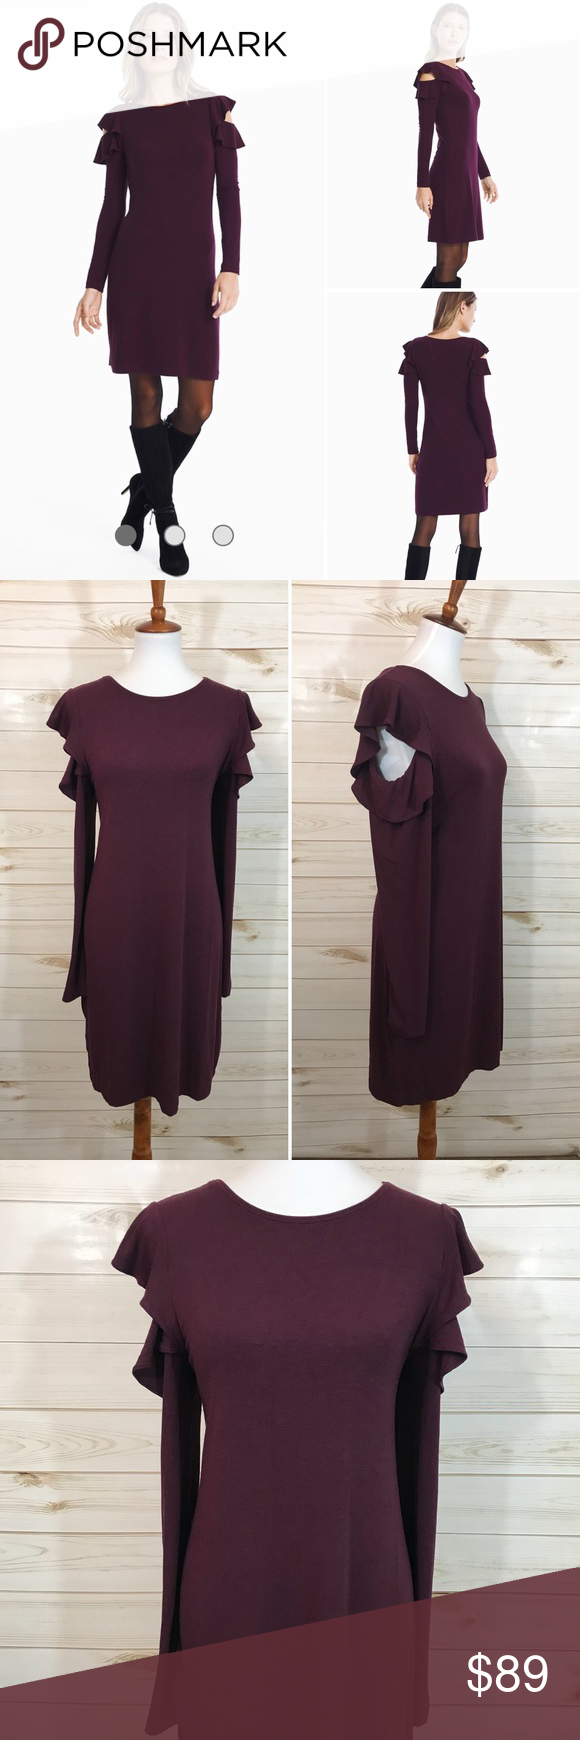 Whbm long sleeve ruffle cold shoulder dress nwt dress brands